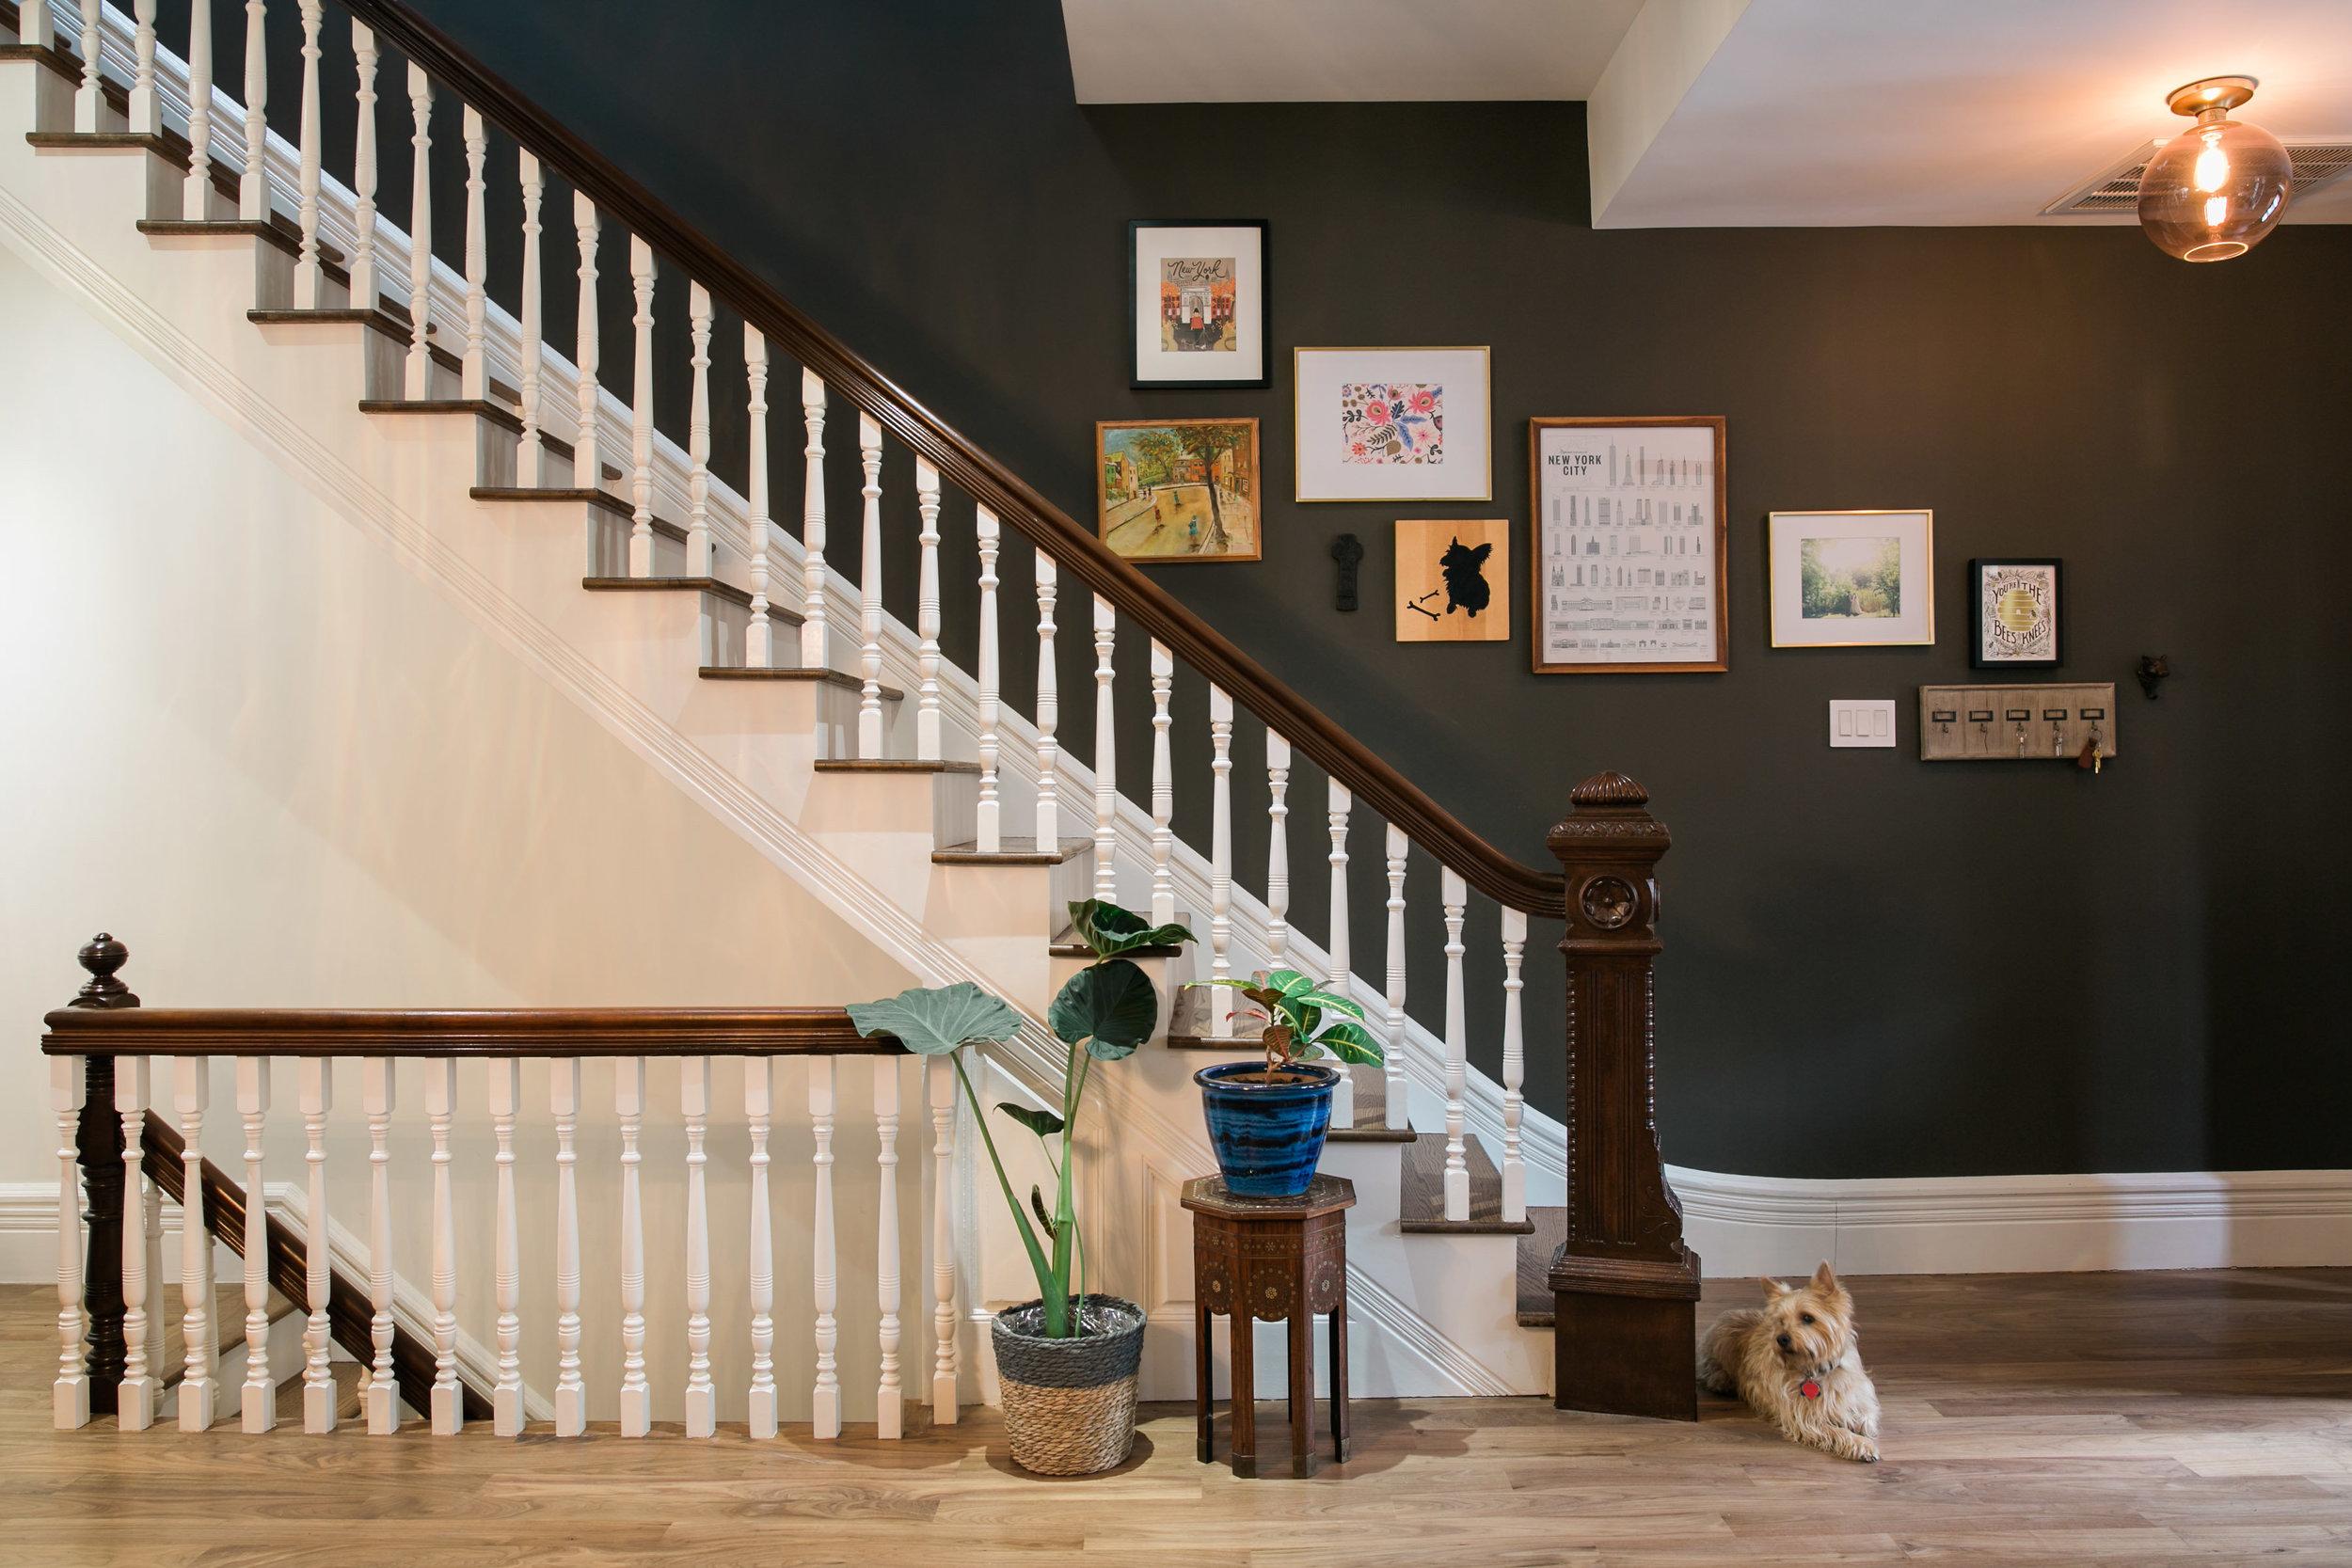 Staircase_005-2.jpg